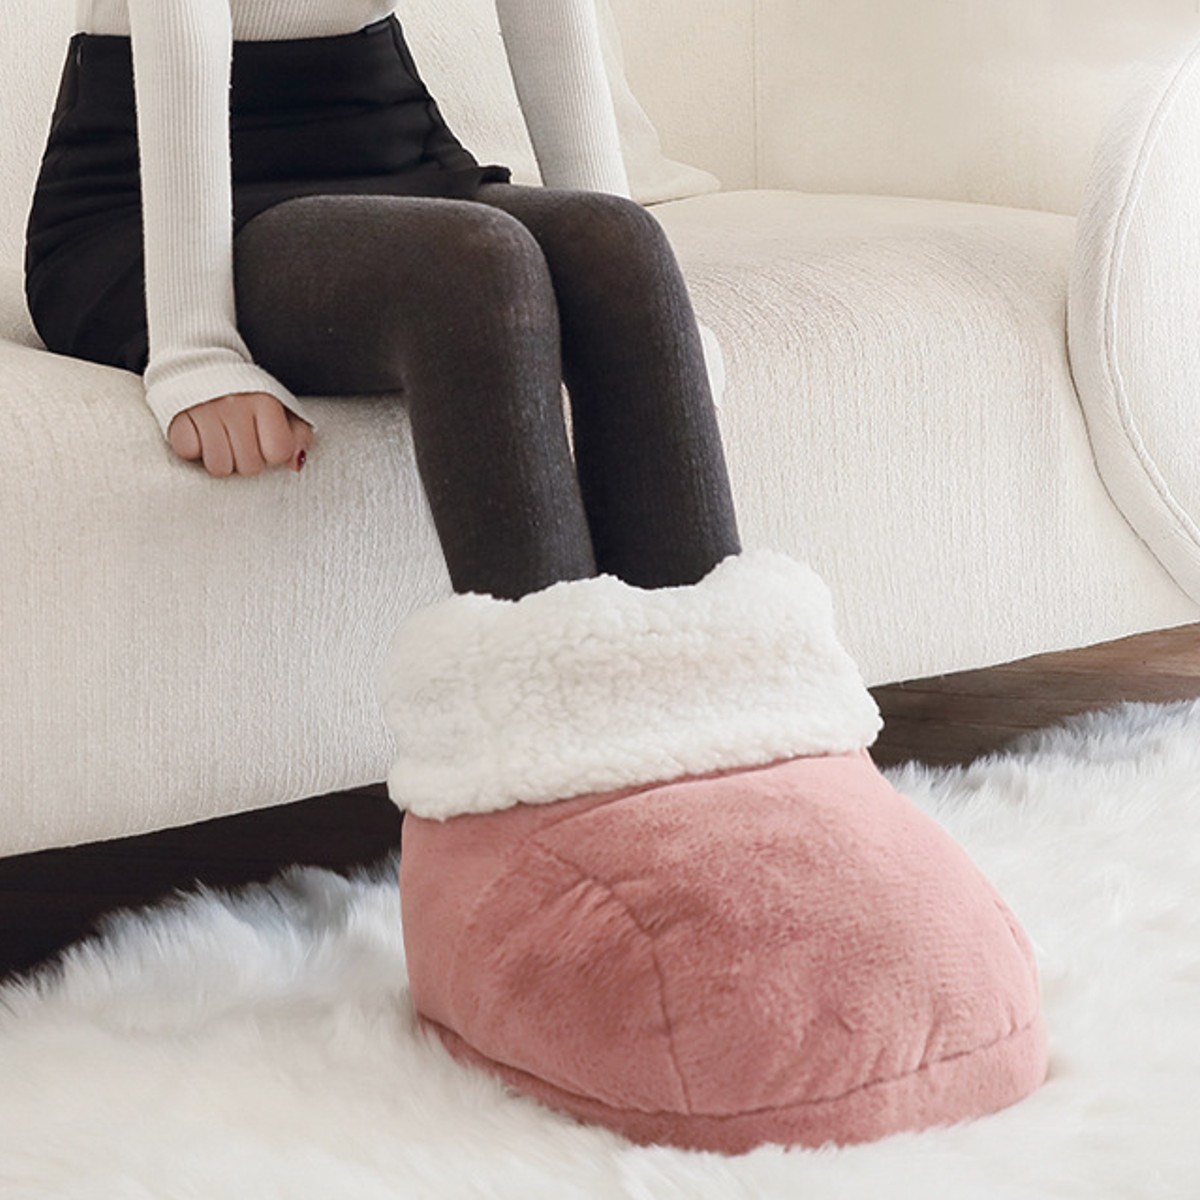 Electric Warm Heating Pad Foot Warmer Feet Shoes Warmer Electric Heat Slippers Warm Hairy Cushion USB Foot Warmer Pink Brown